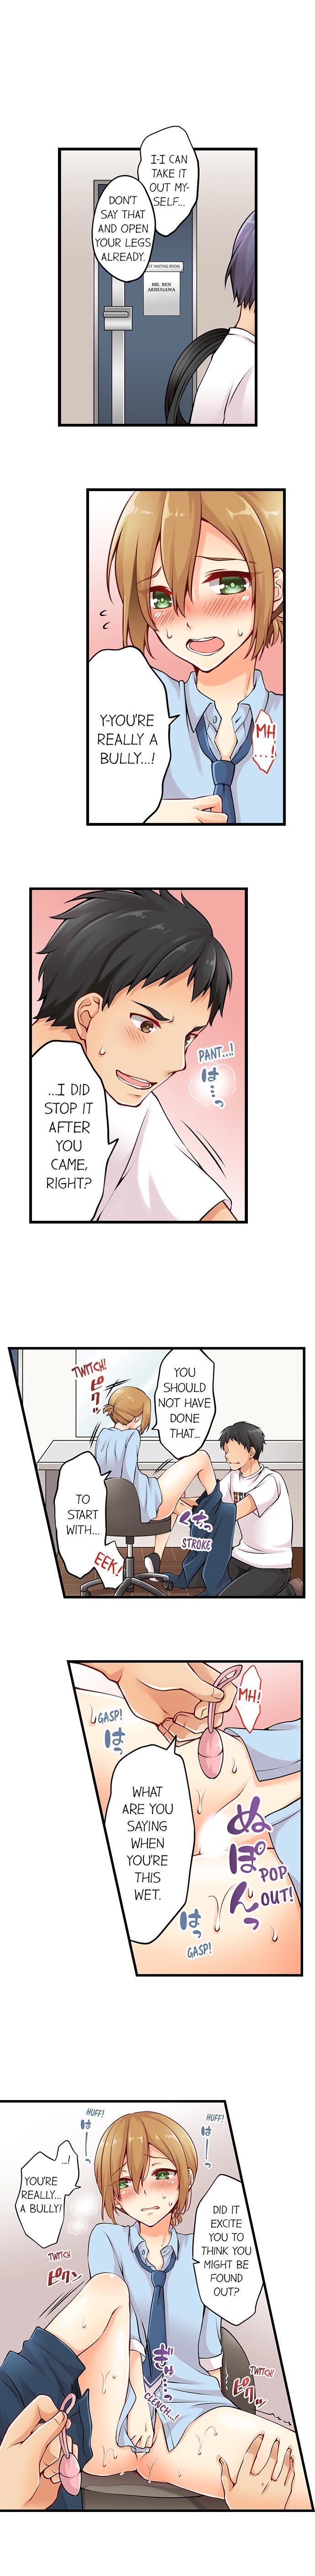 Ren Arisugawa Is Actually A Girl 33